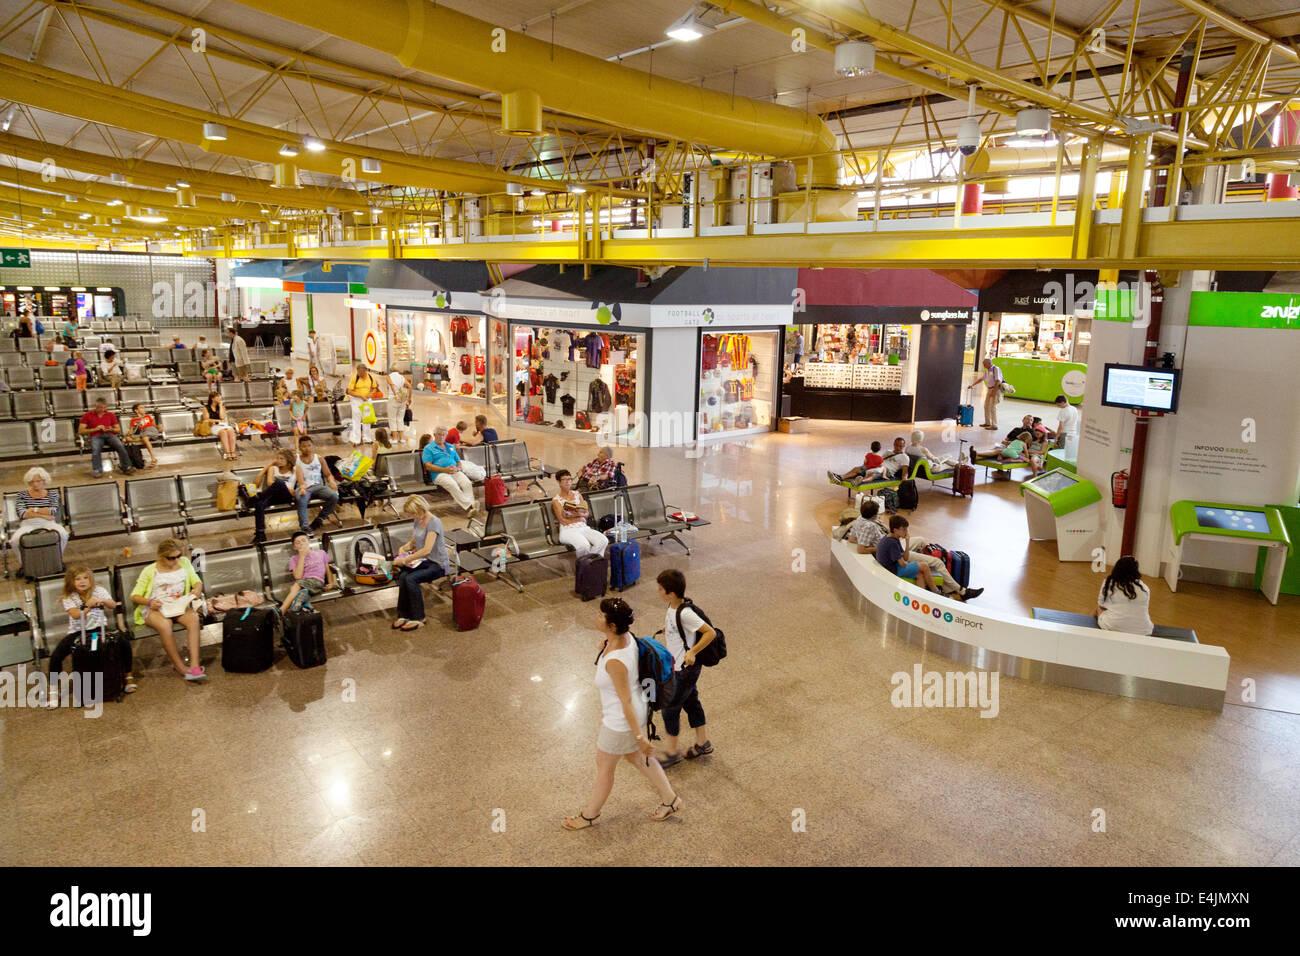 Faro airport departure lounge interior, the terminal, Faro airport, the Algarve, Portugal - Stock Image